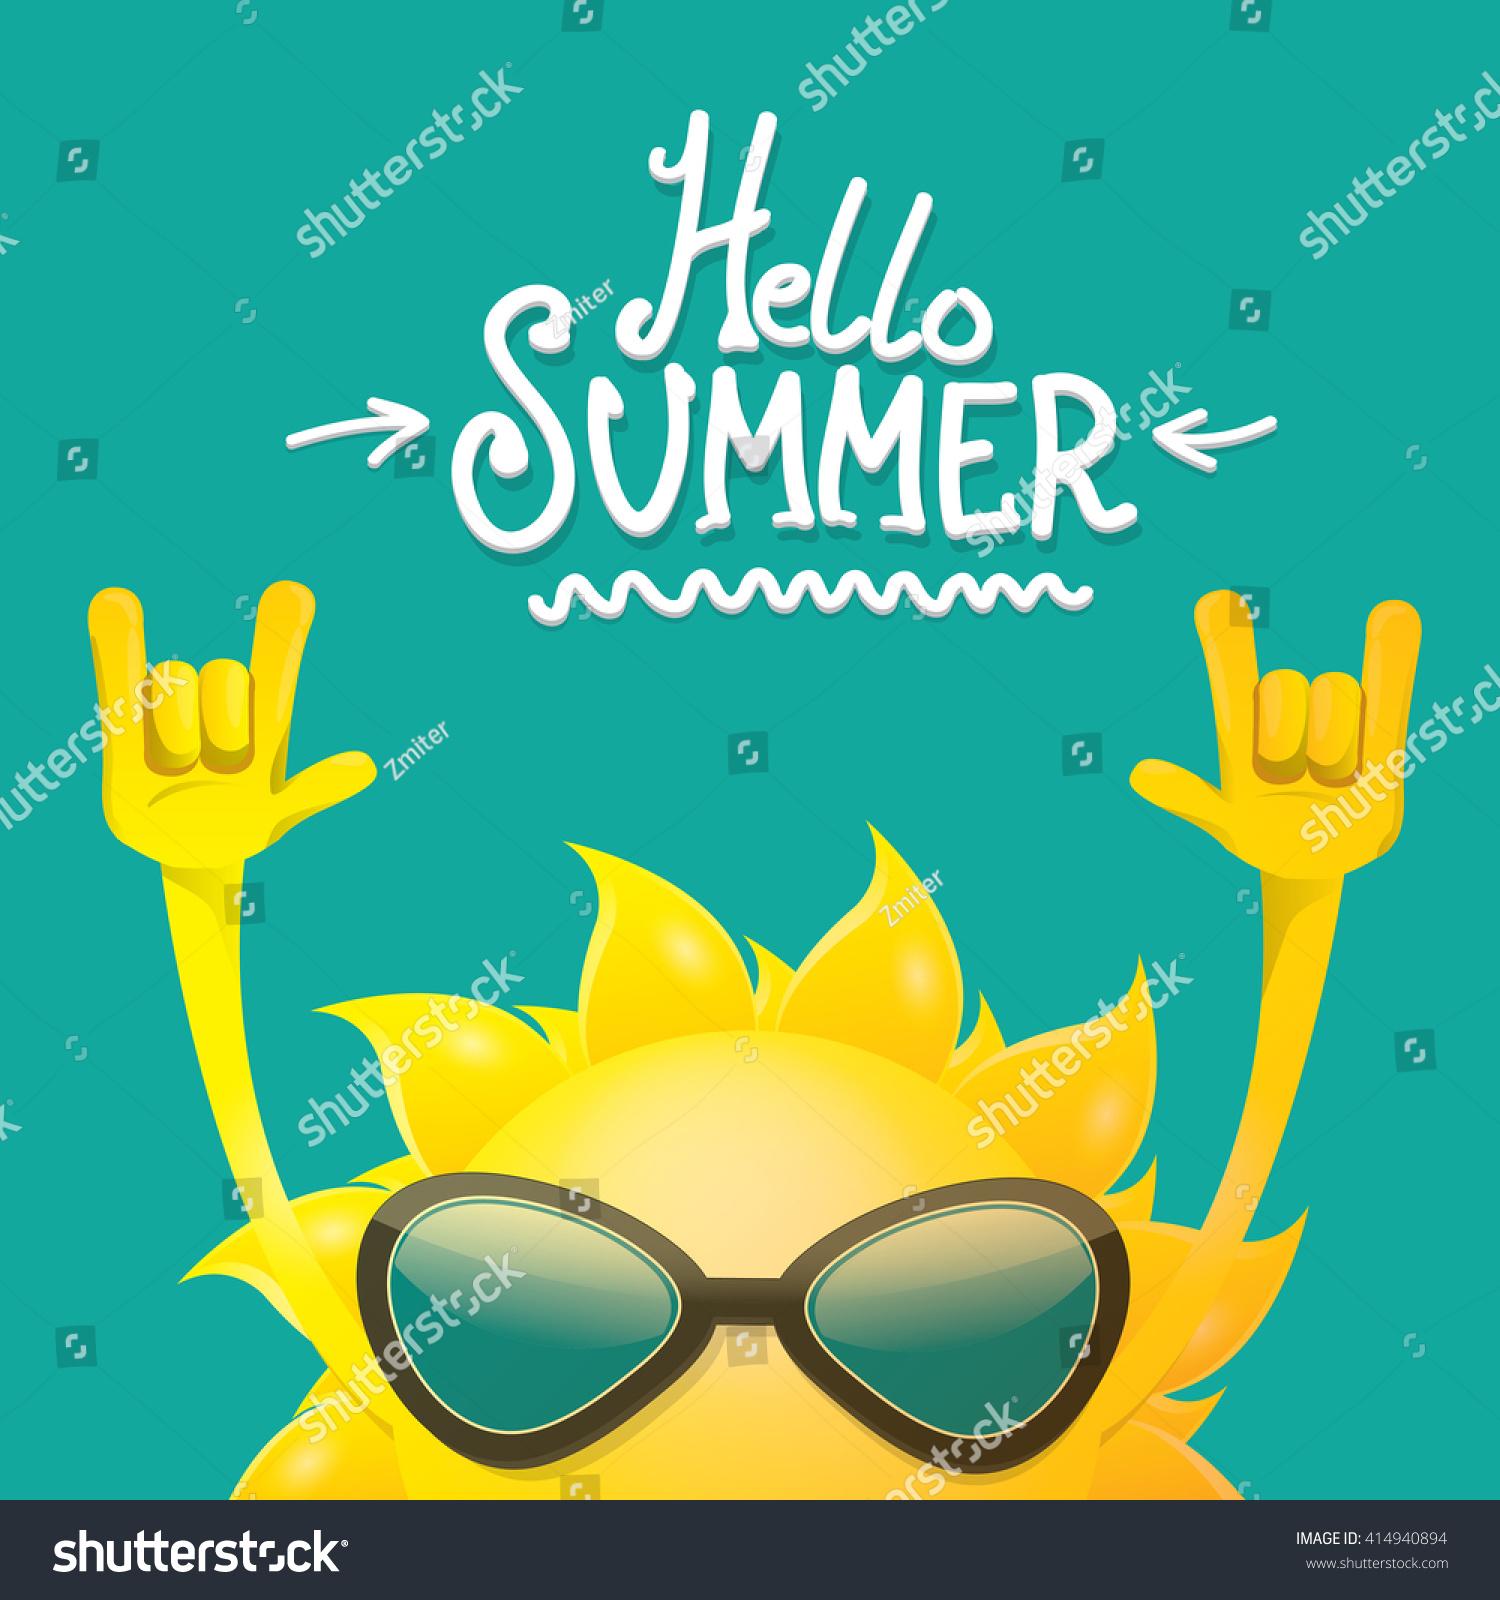 Rock n roll poster design - Hello Summer Rock N Roll Poster Summer Party Design Template